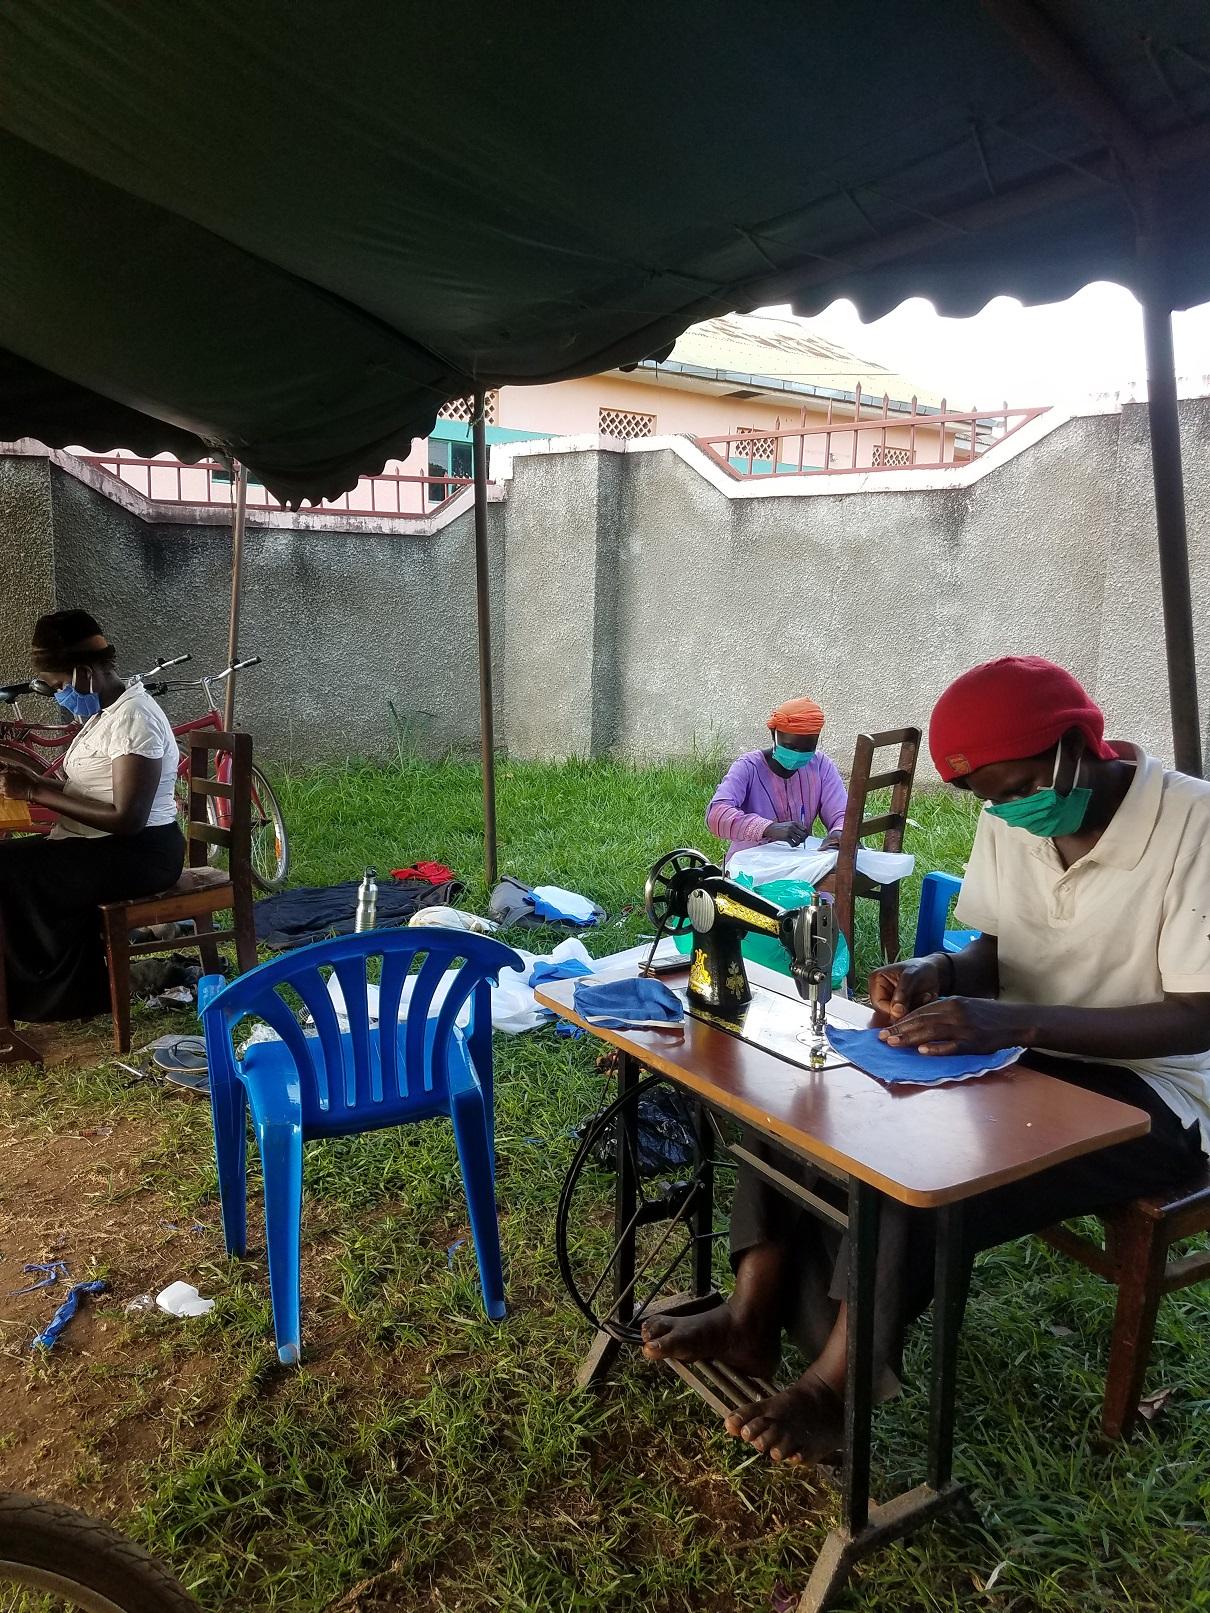 Ugandan women sewing under open air tent